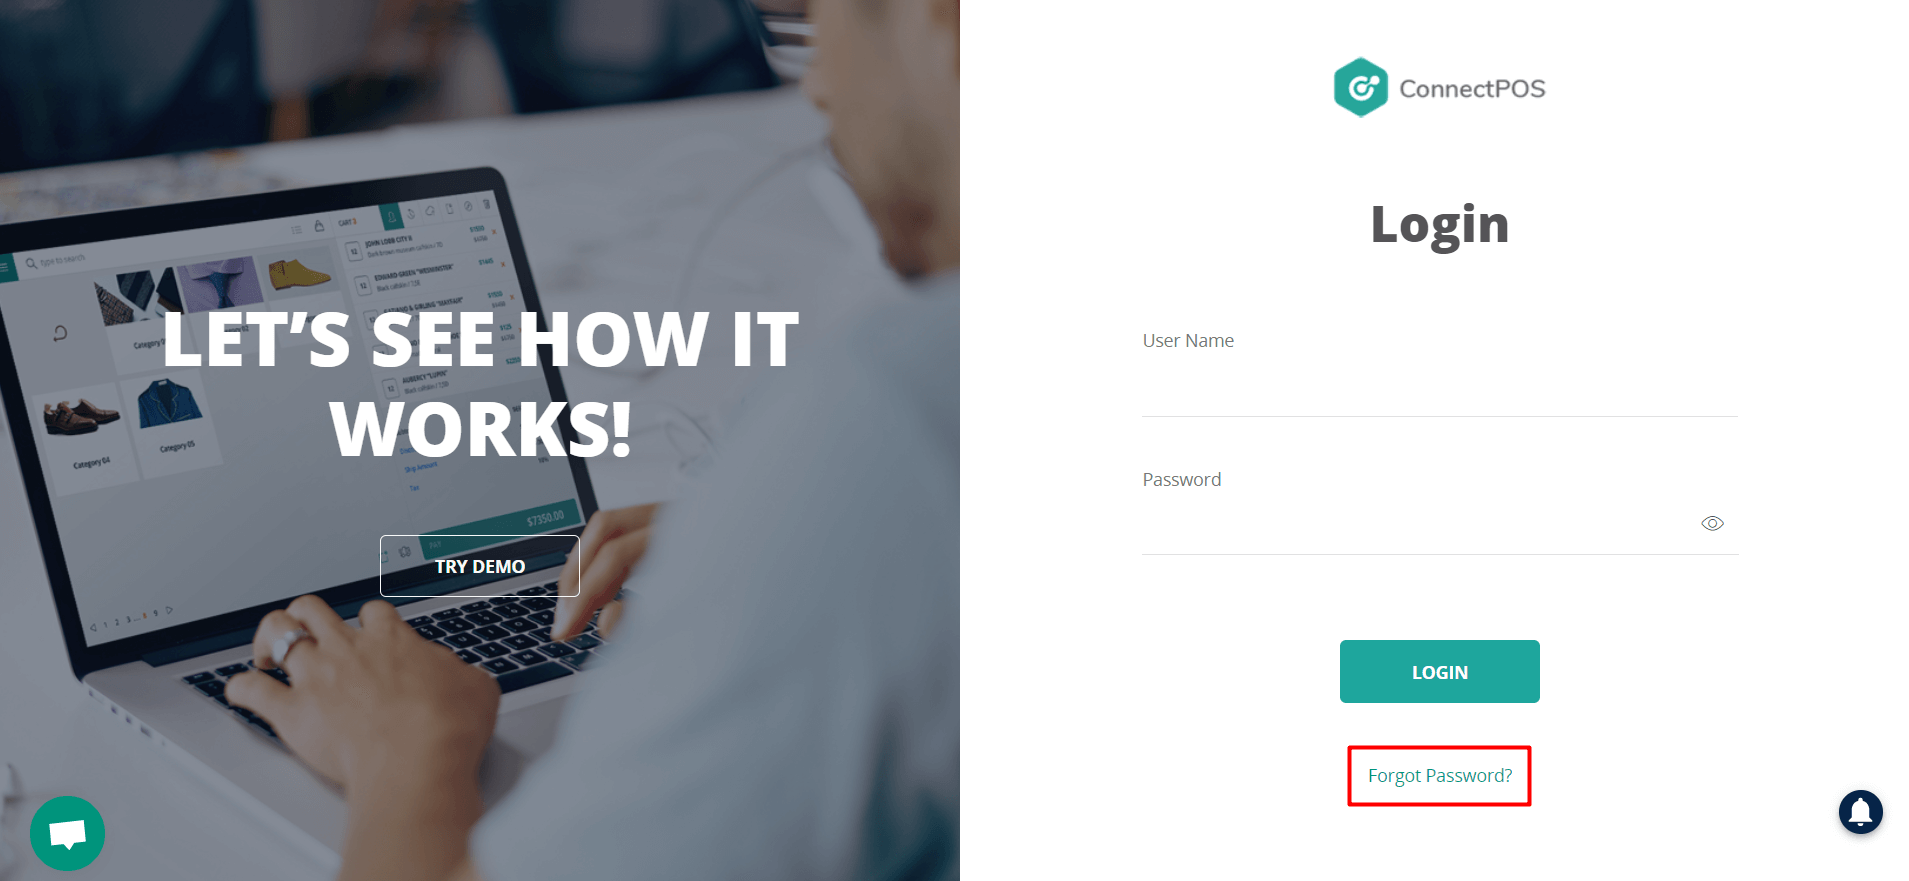 ConnectPOS login page